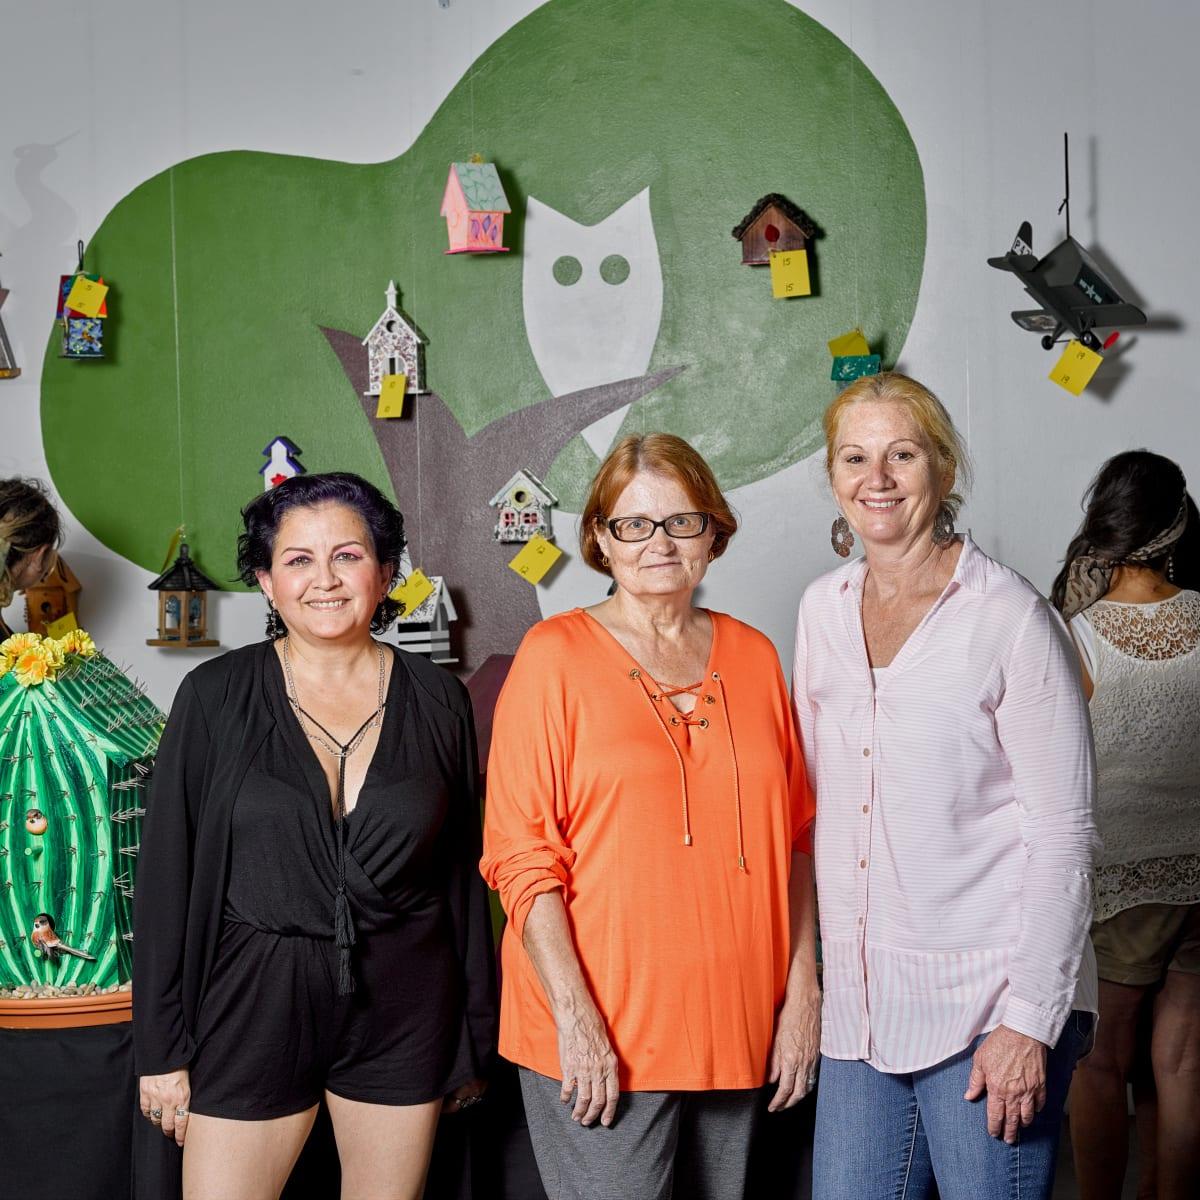 Event chairs Monica Melgar, Janet Roe with Houston Arboretum director Debbie Markey at Sawyer Yards Artist Stroll